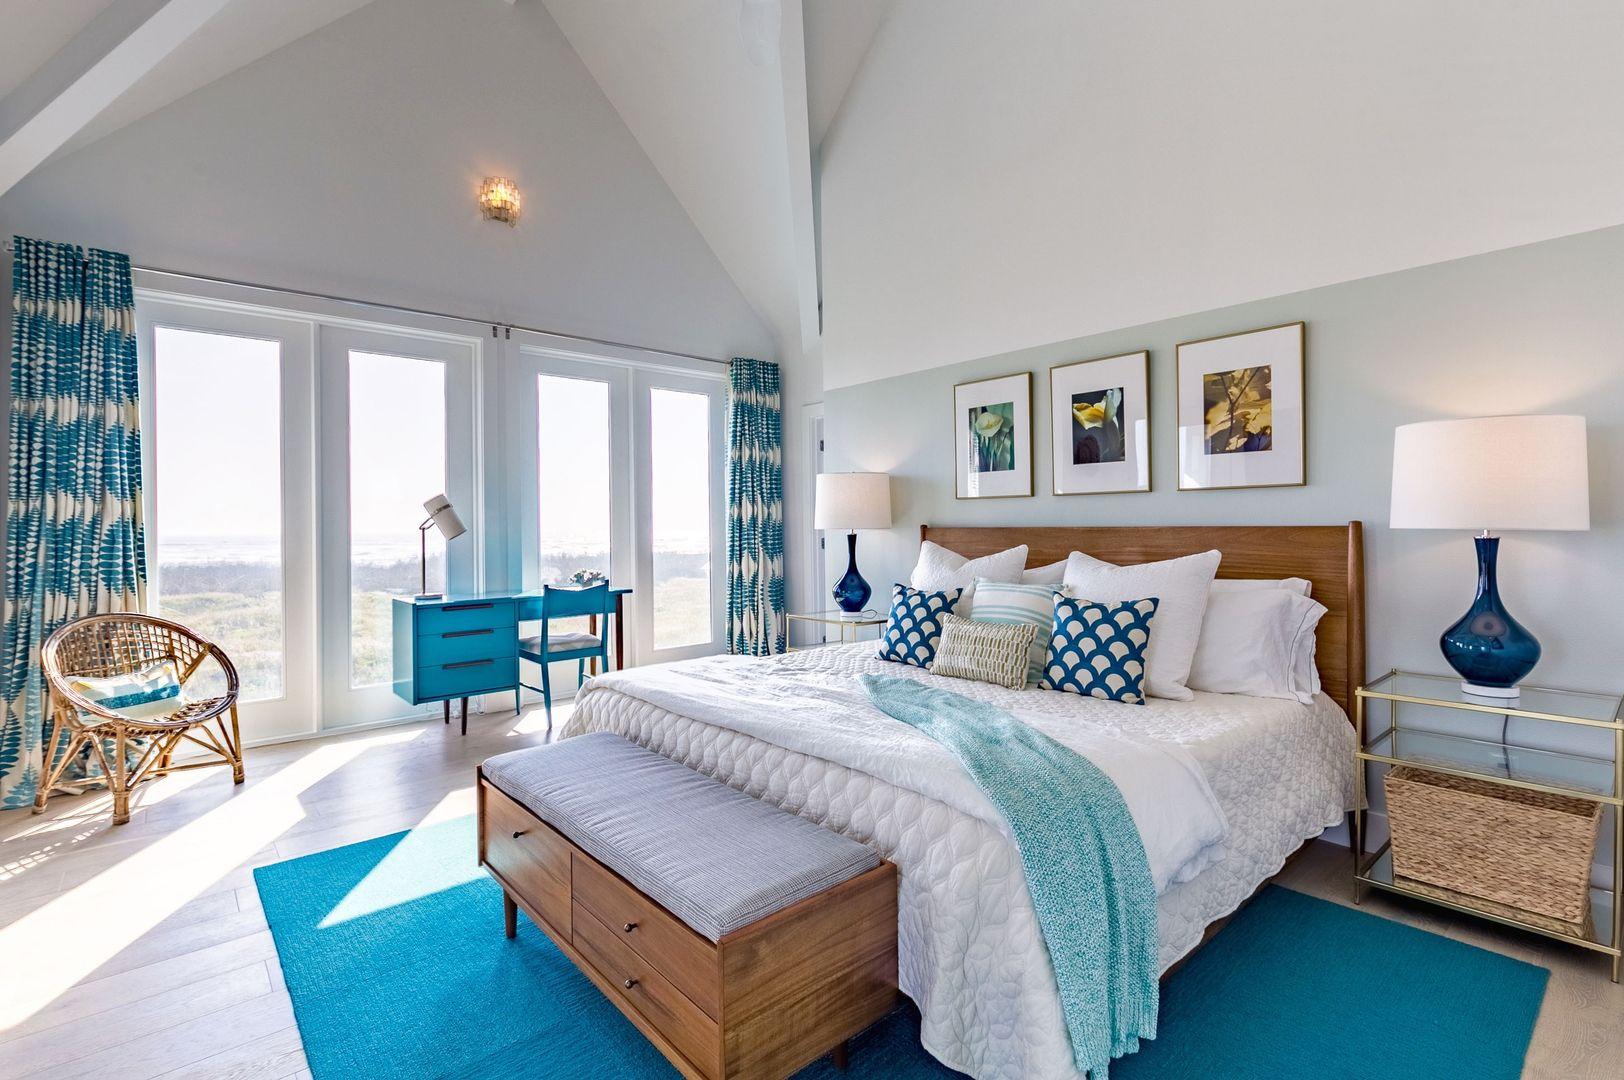 Teal Turquoise And Aloe Beach House Bedroom Modern Beach Design